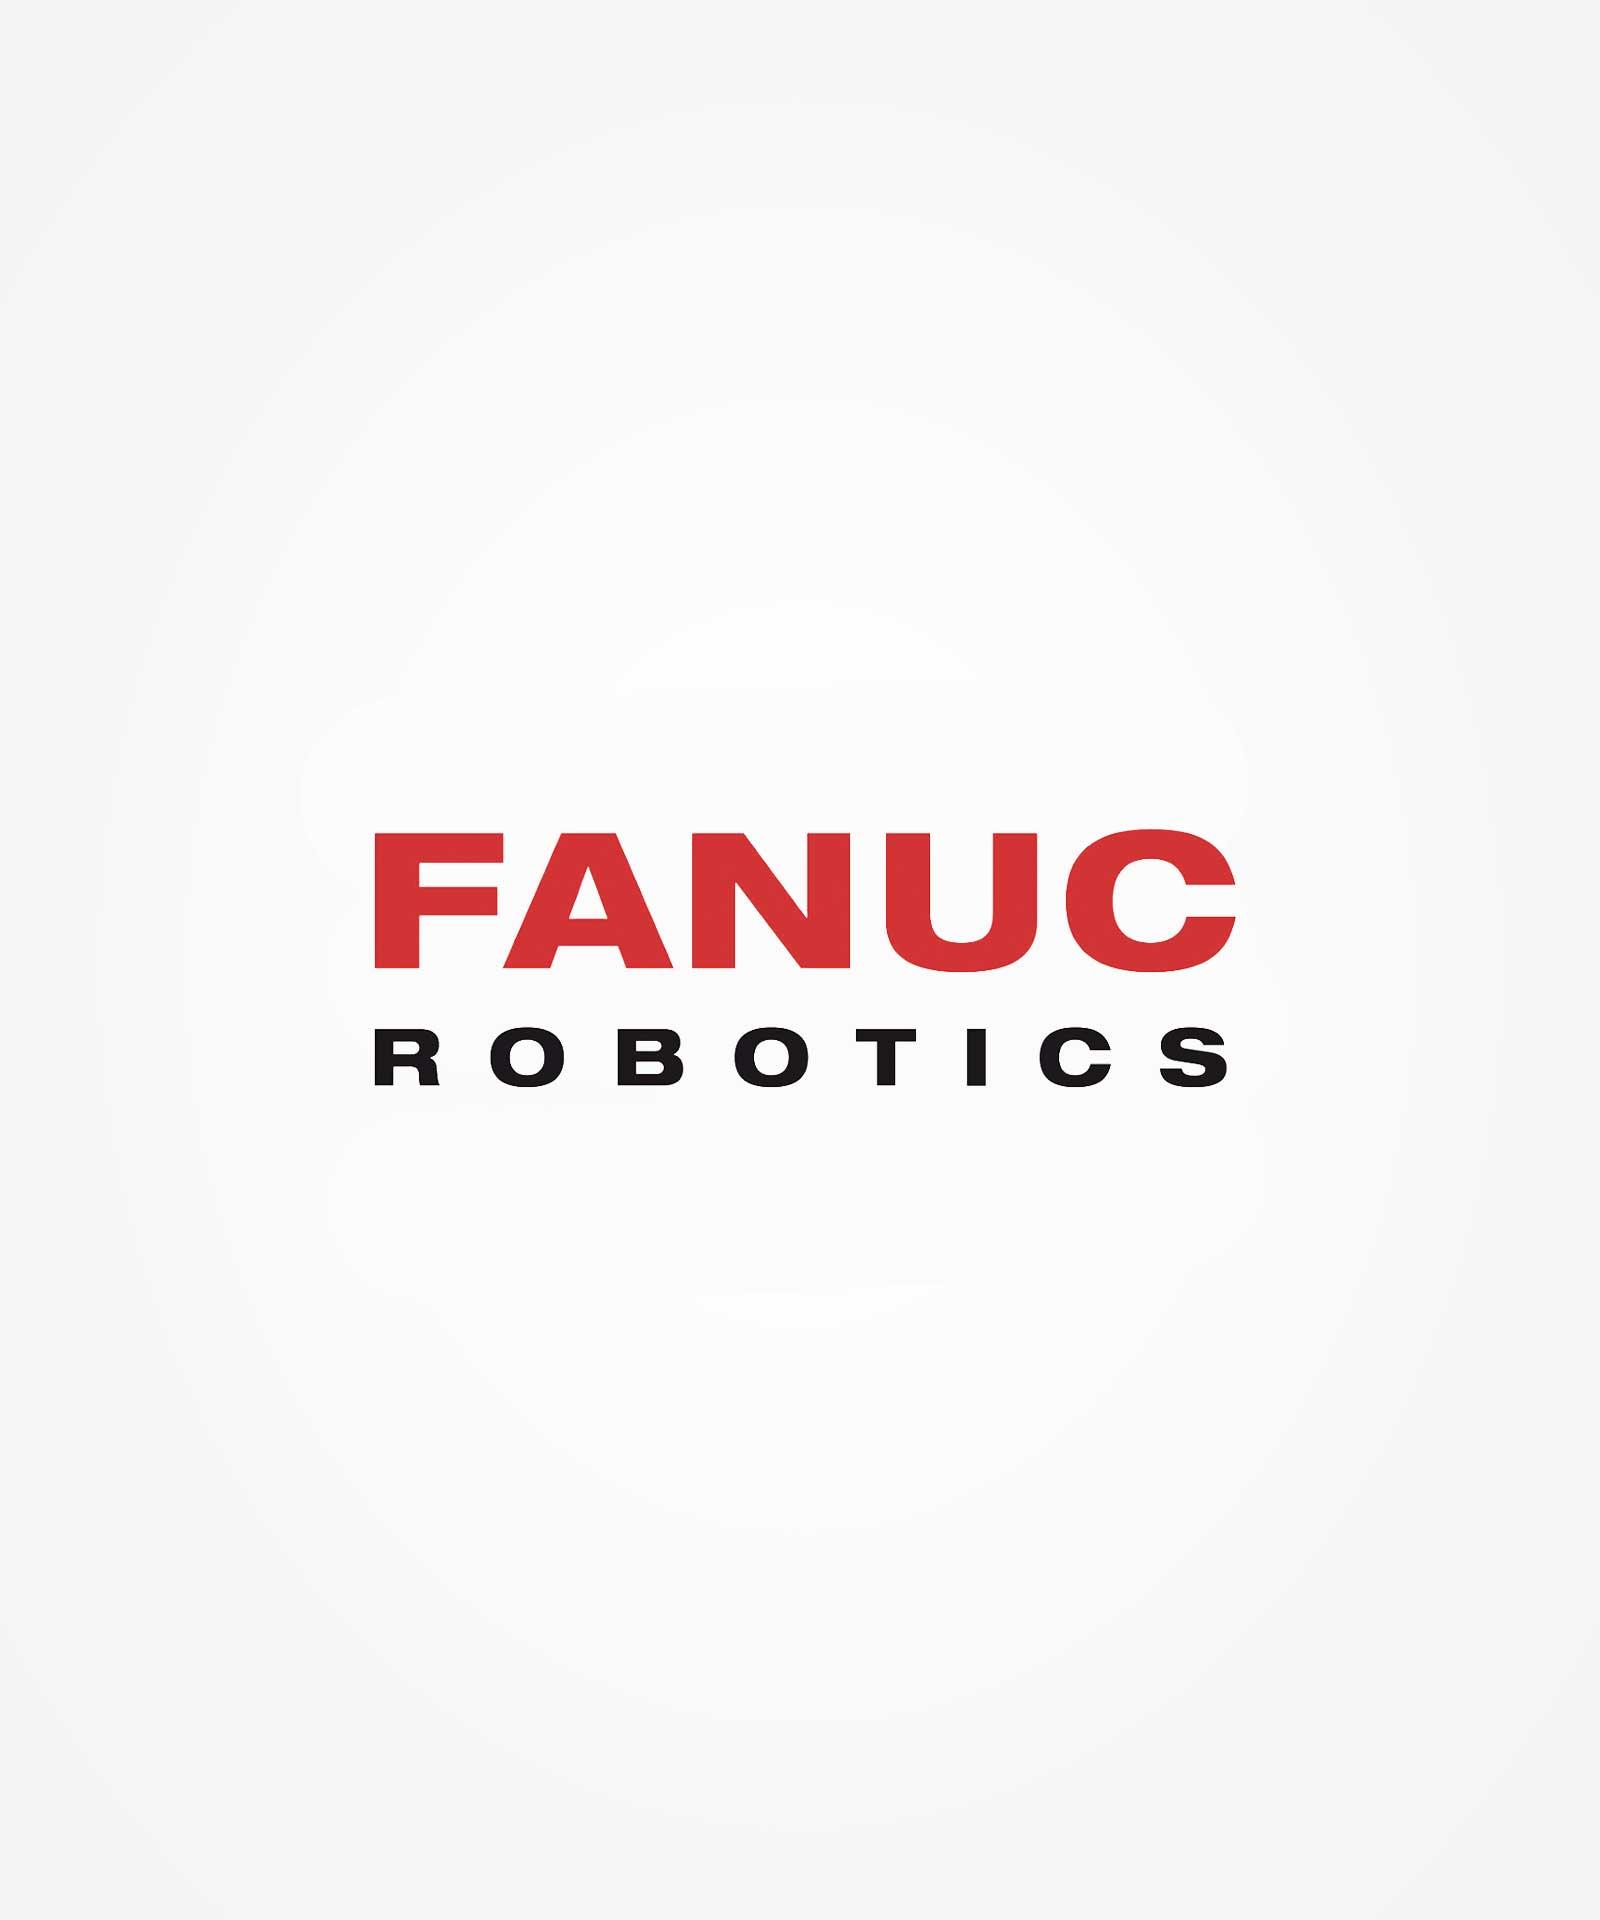 Fanuc-Robotics